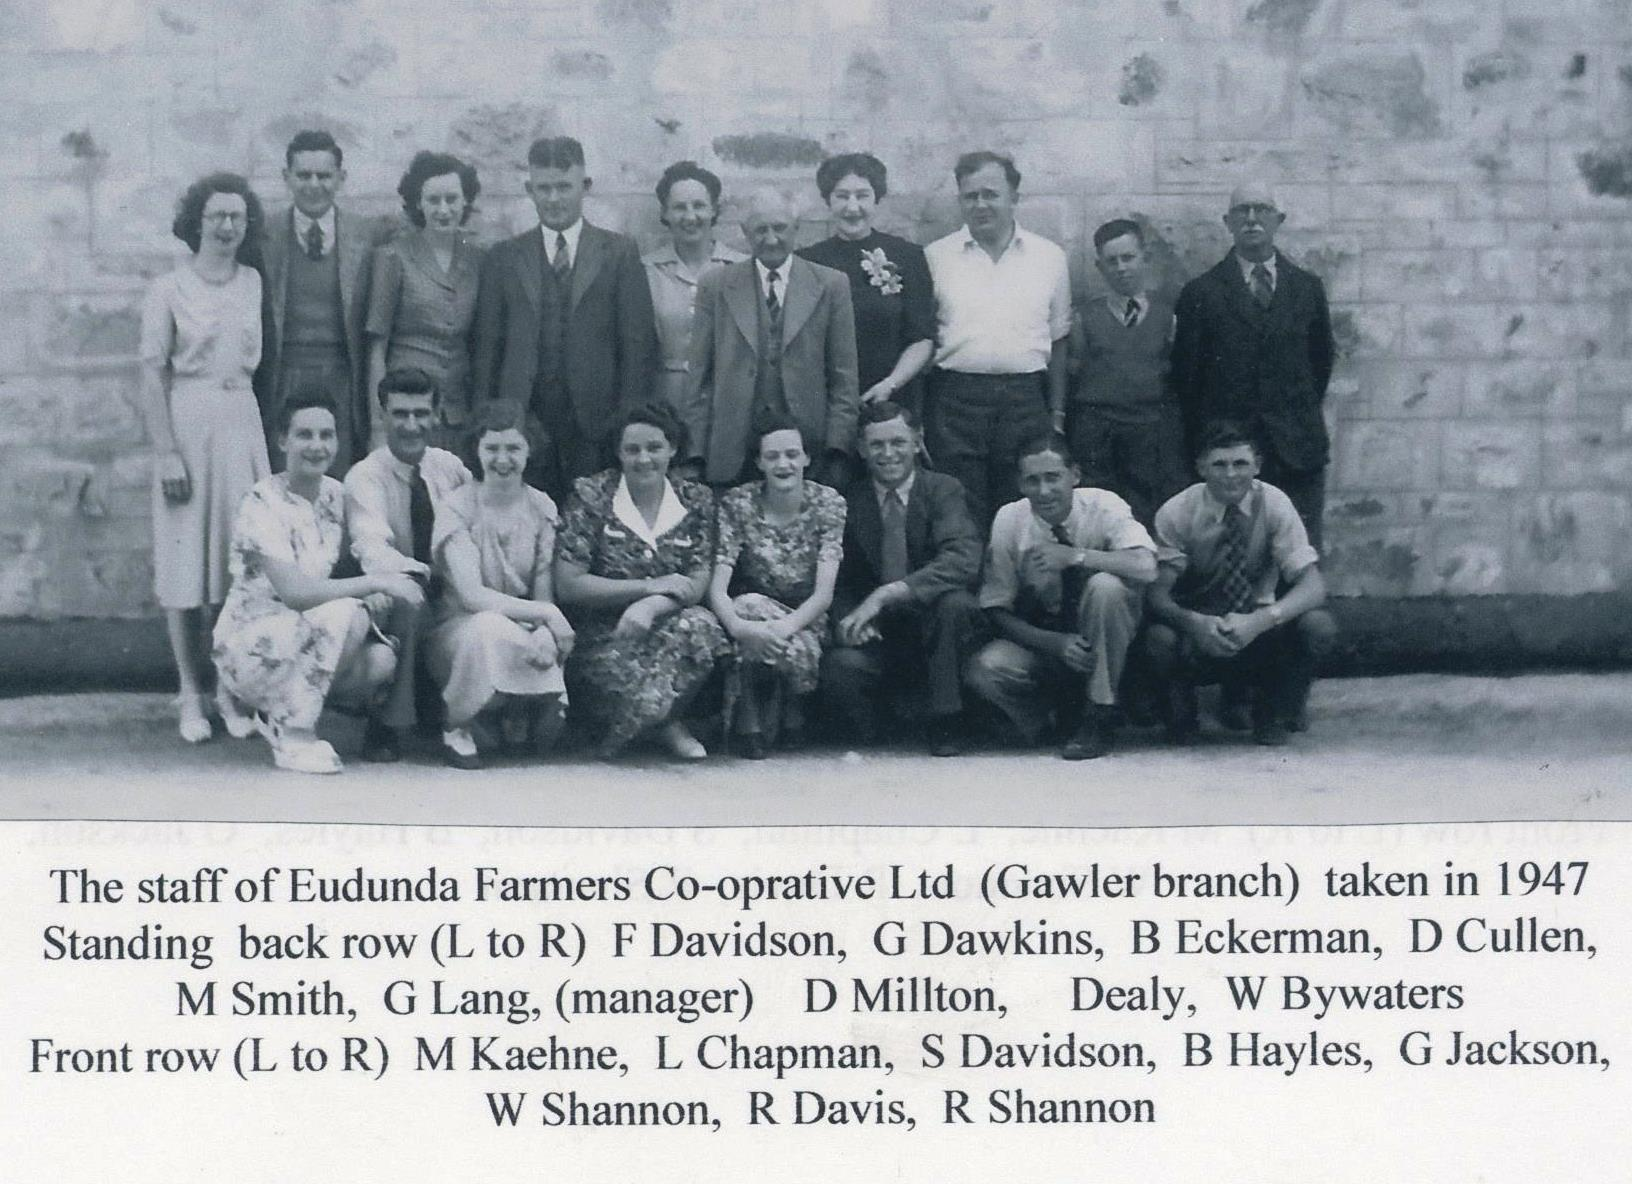 Eudunda Farmers' Staff 1947